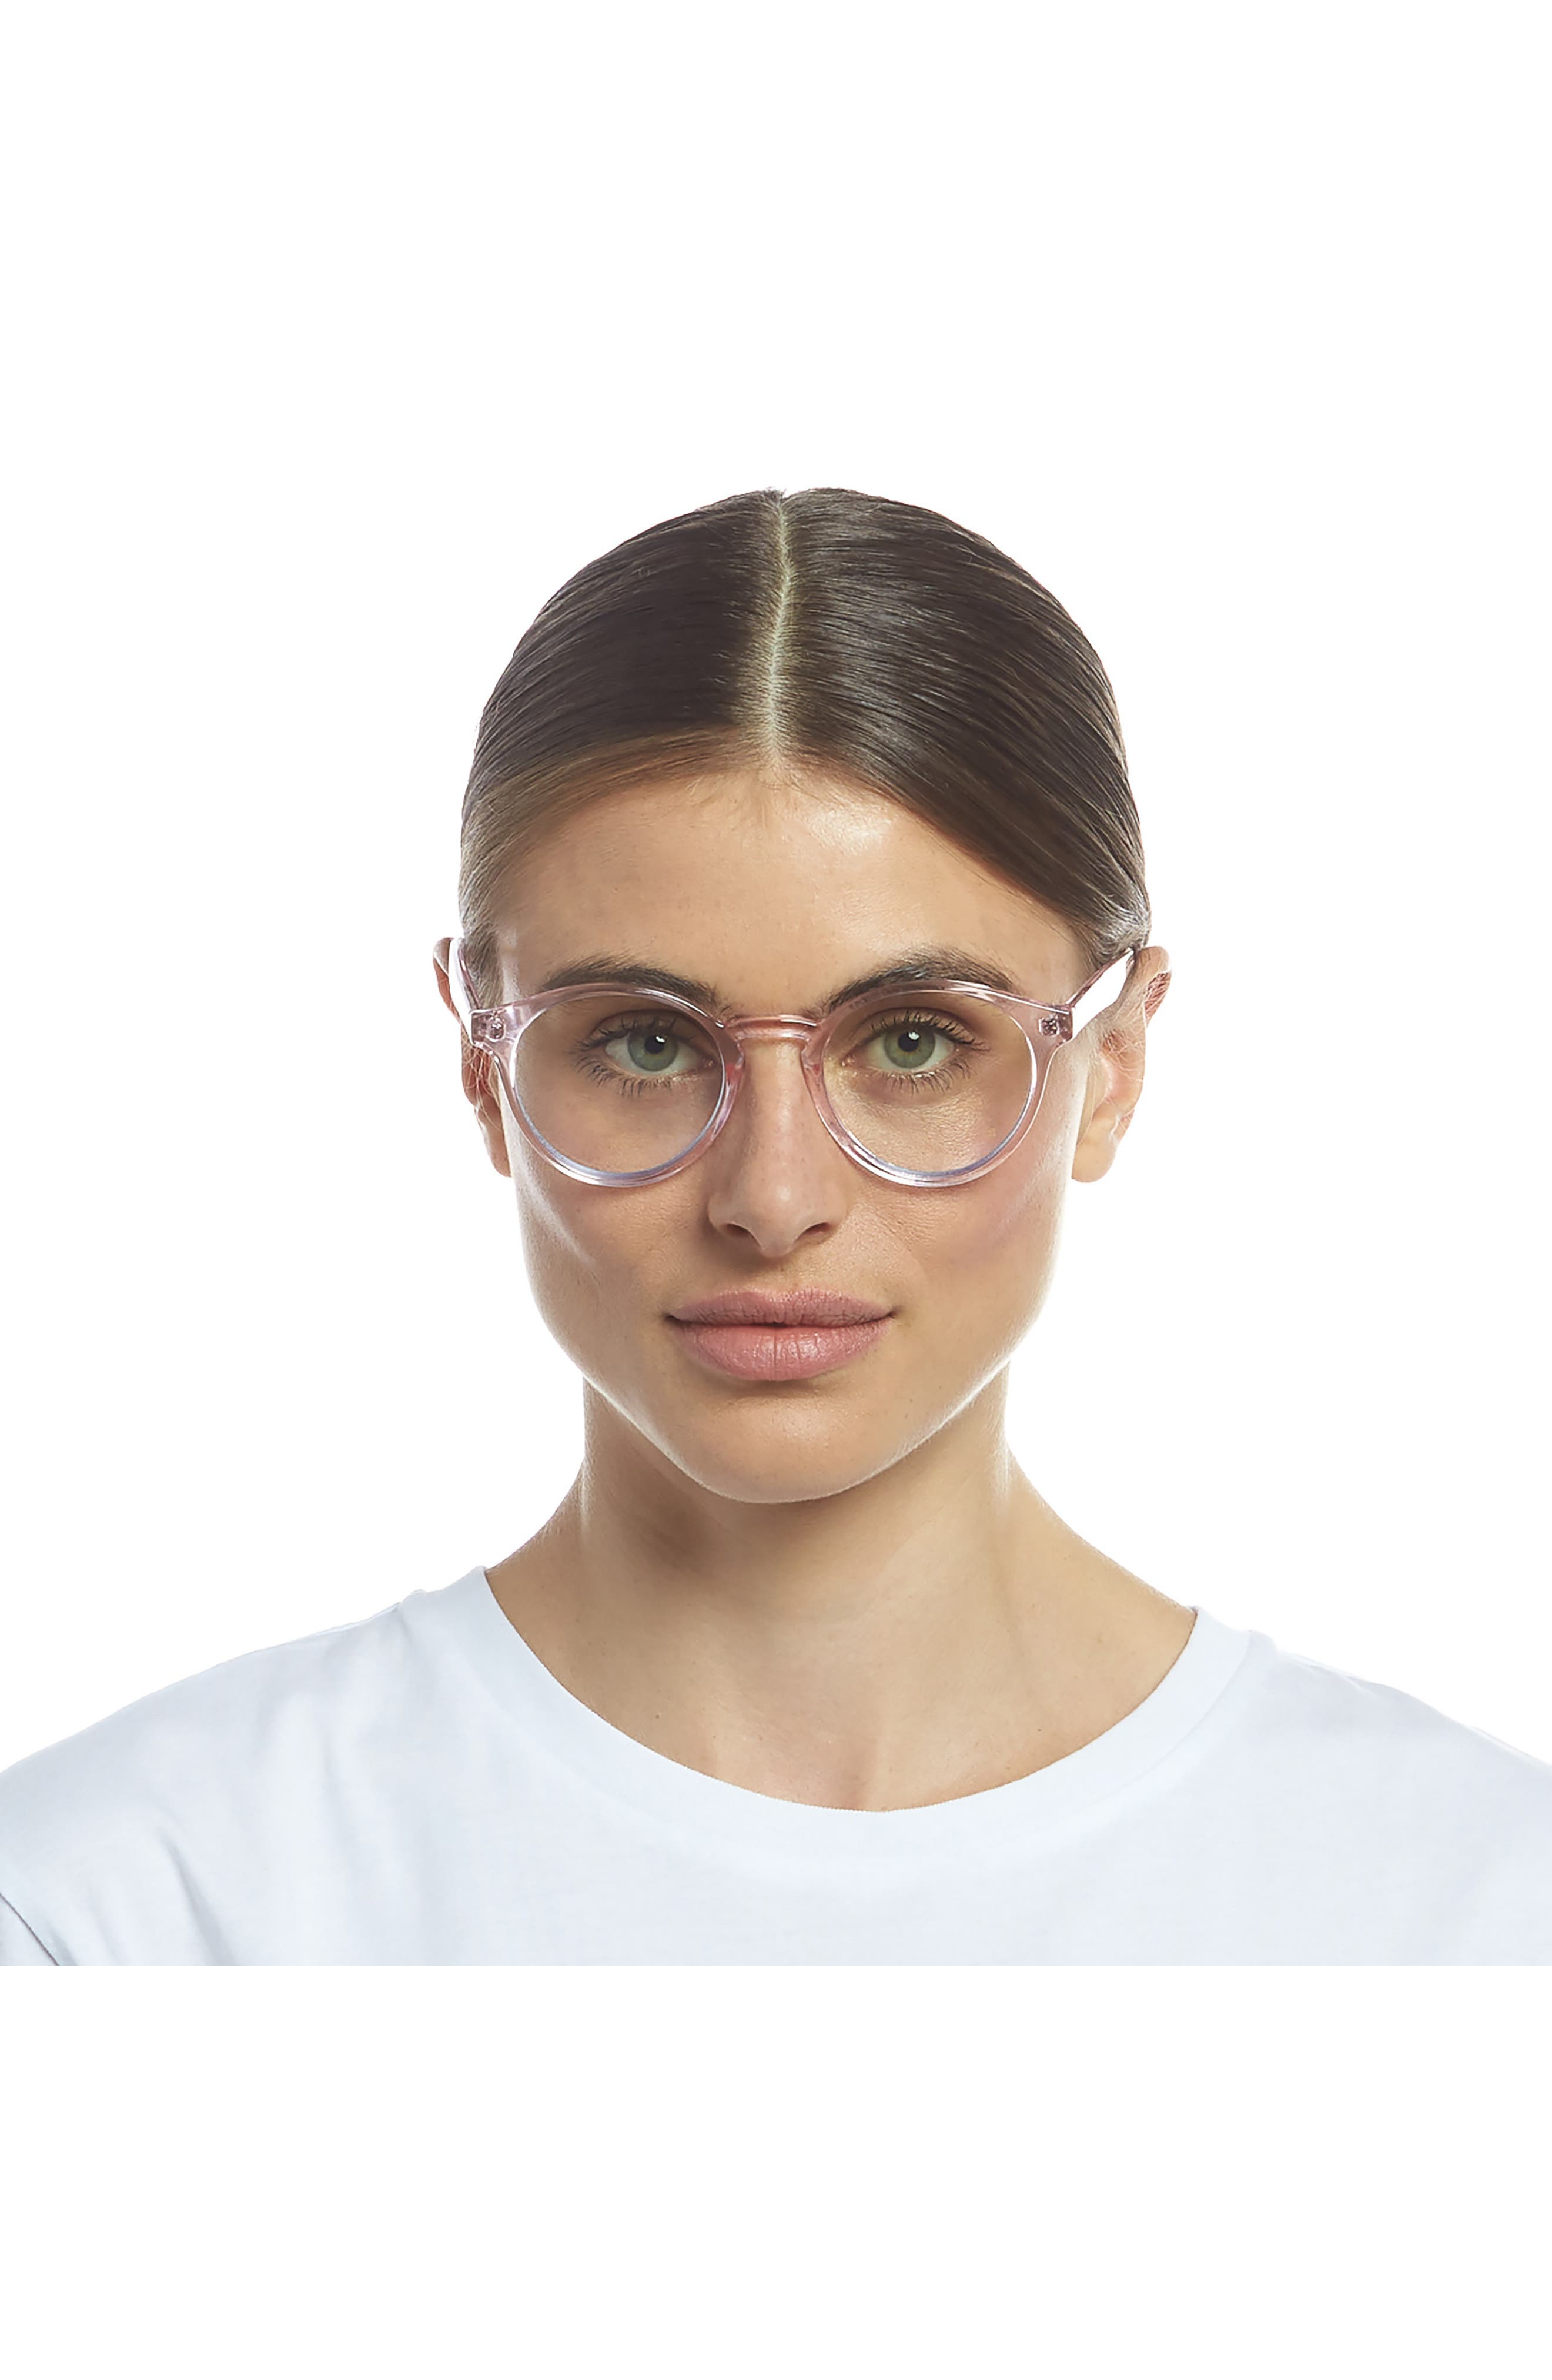 Whirlwind 48mm Small Blue Light Blocking Glasses